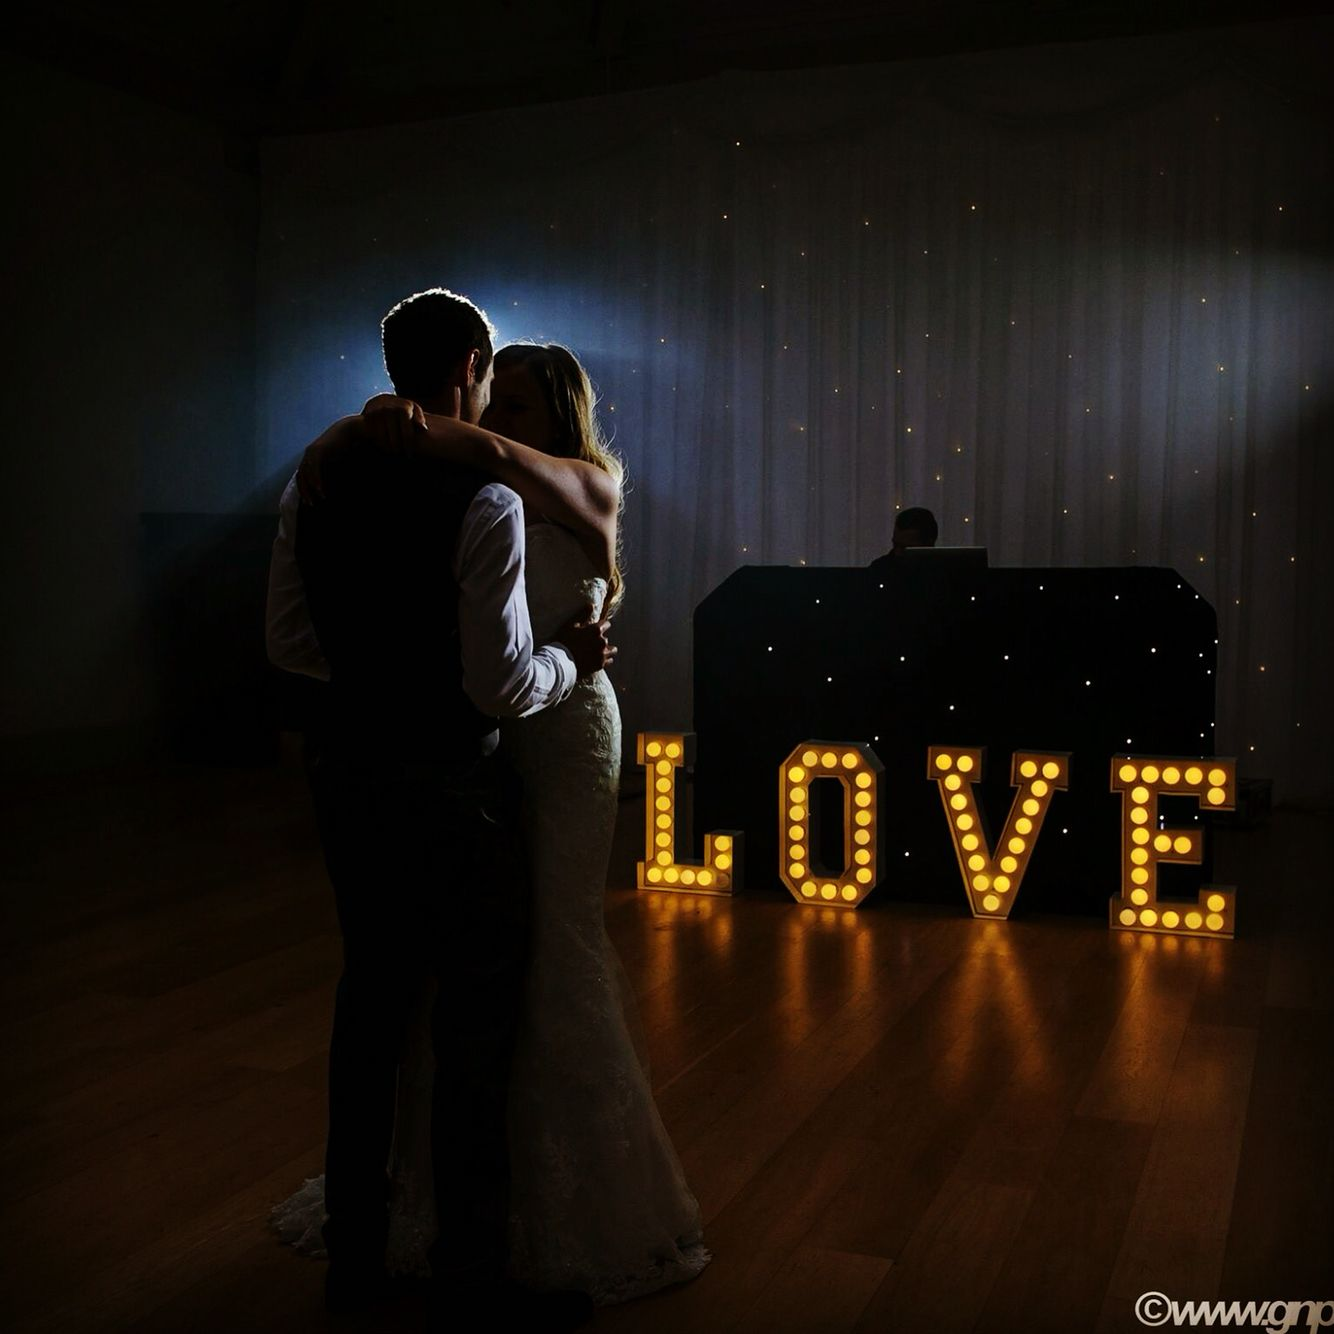 Love is in the air #weddingphotography #weddingphotographer